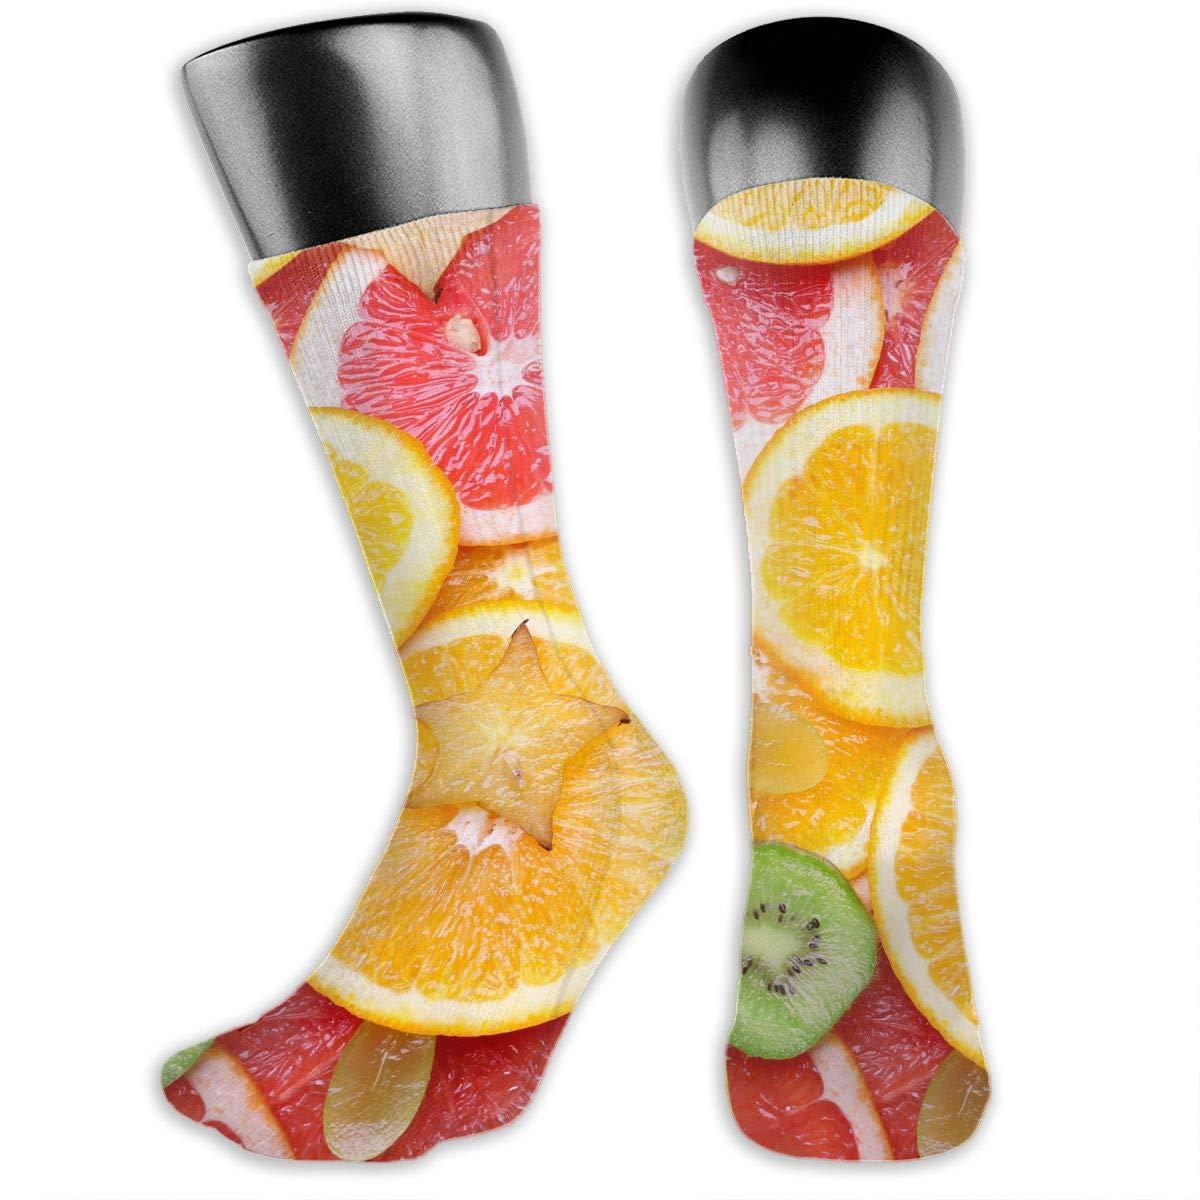 OLGCZM Lemon Pattern Men Womens Thin High Ankle Casual Socks Fit Outdoor Hiking Trail